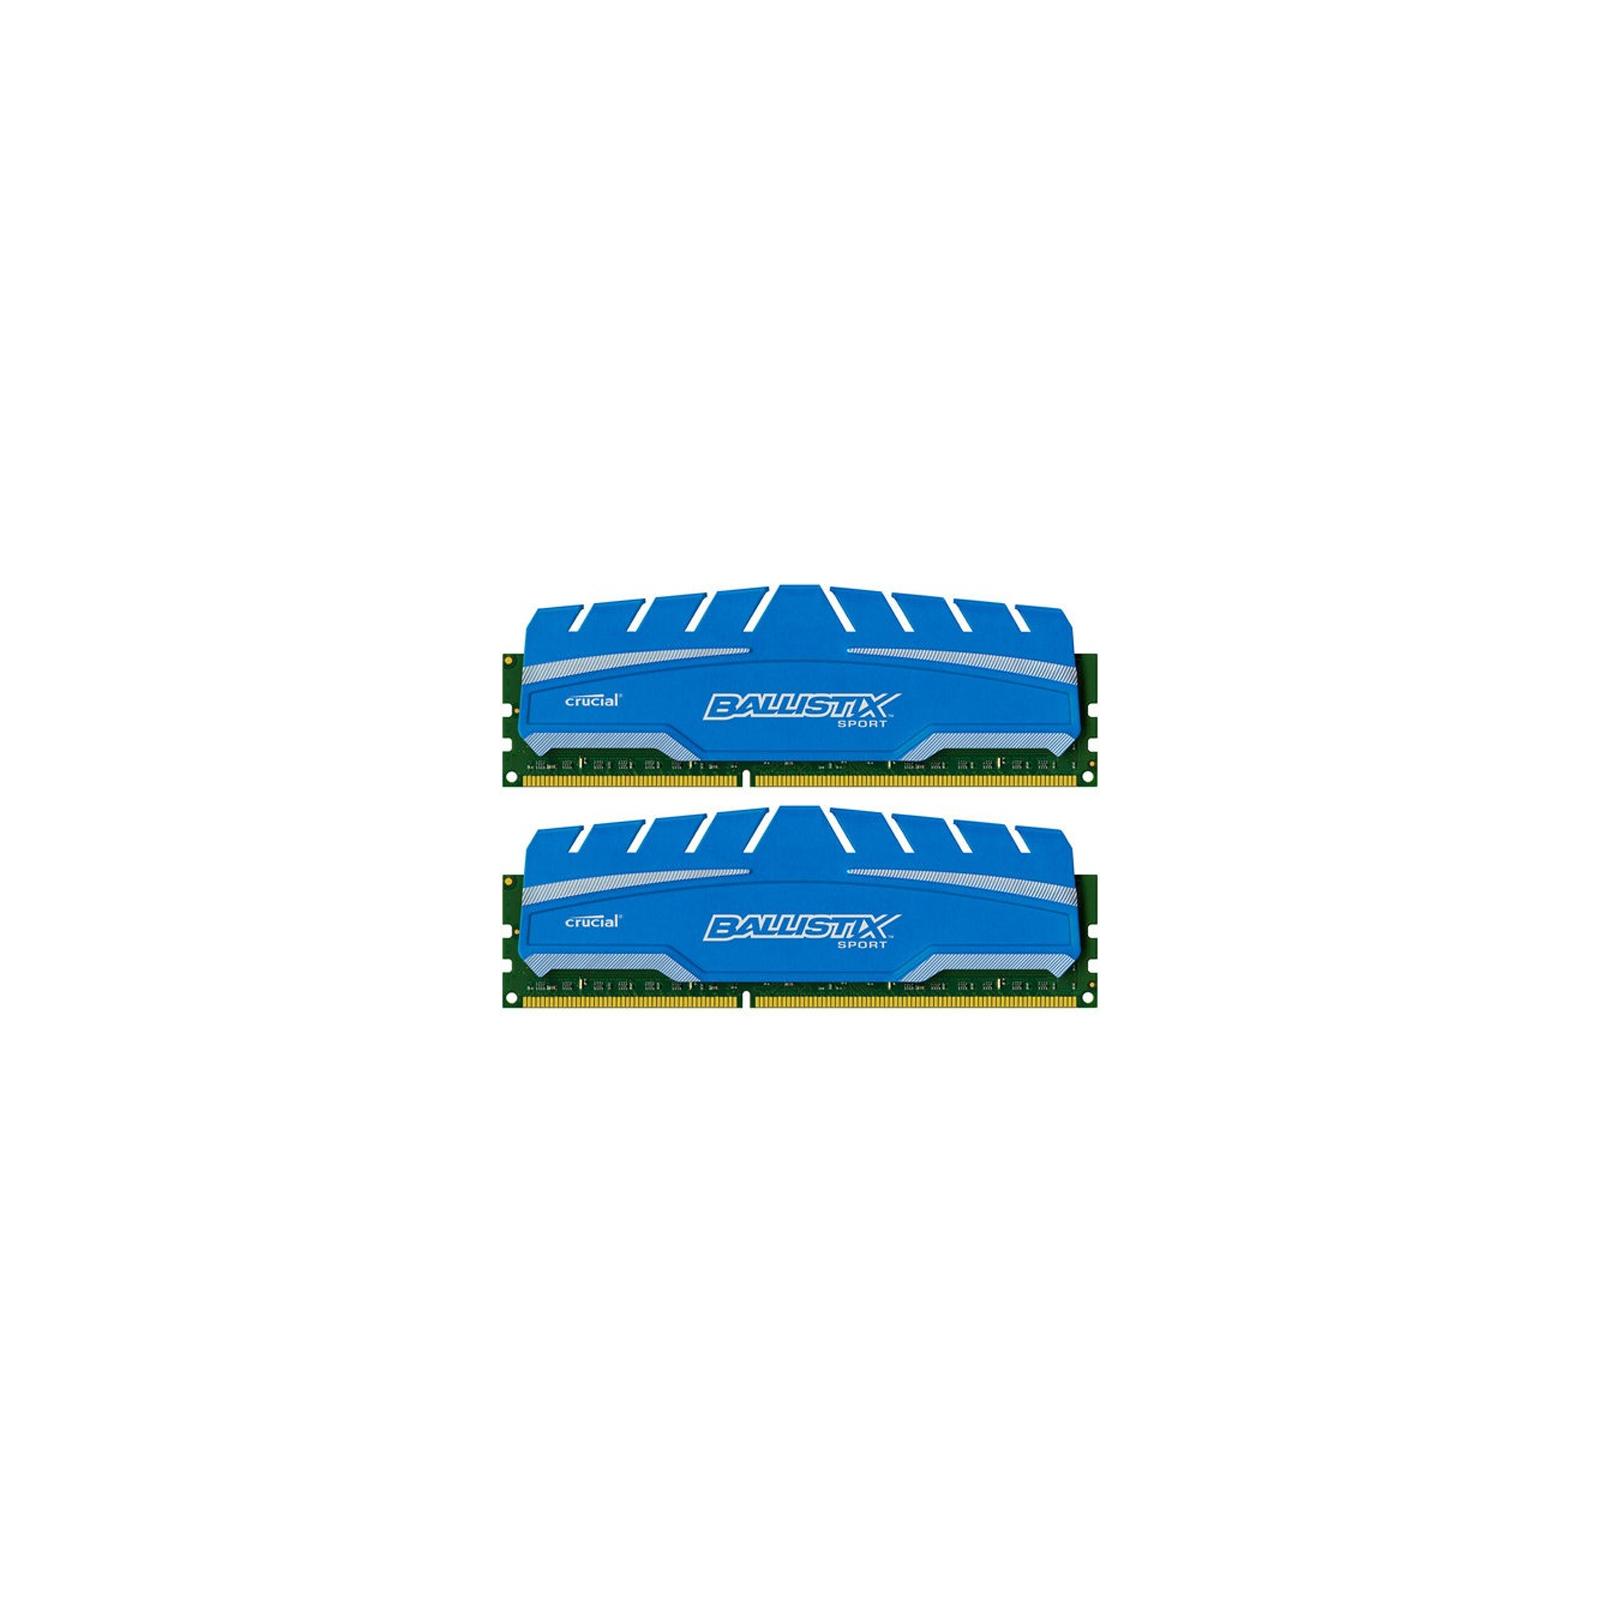 Модуль памяти для компьютера DDR3 8GB (2x4GB) 1600 MHz Ballistix Sport XT MICRON (BLS2C4G3D169DS3CEU)